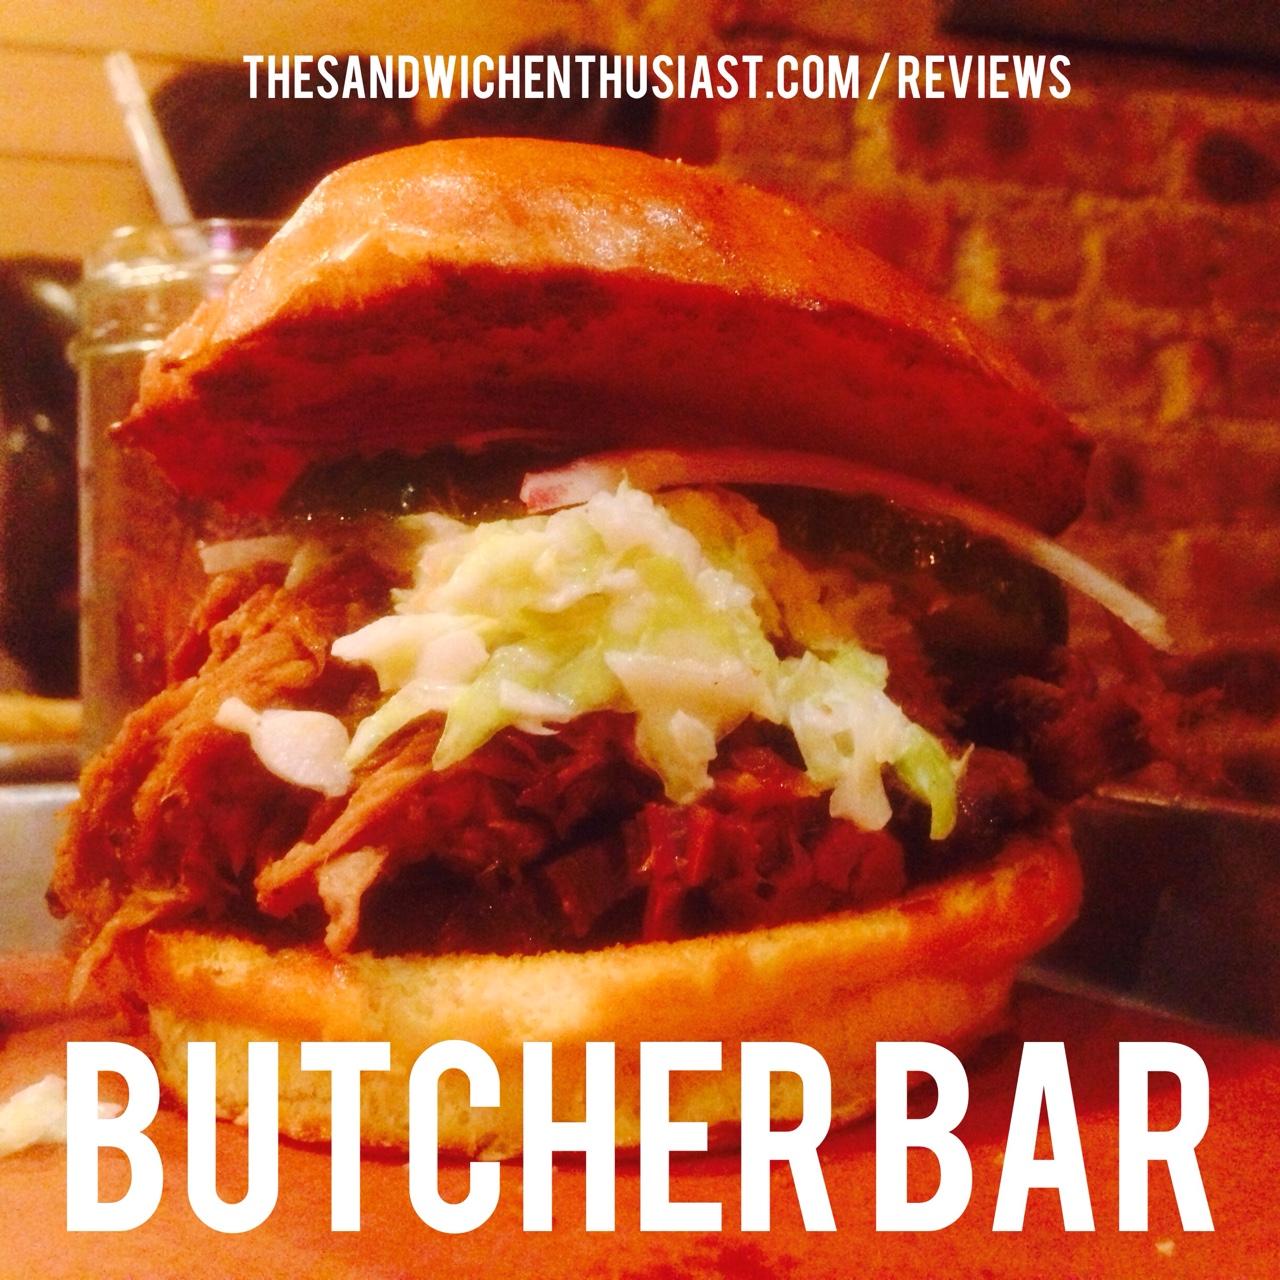 butcherbar